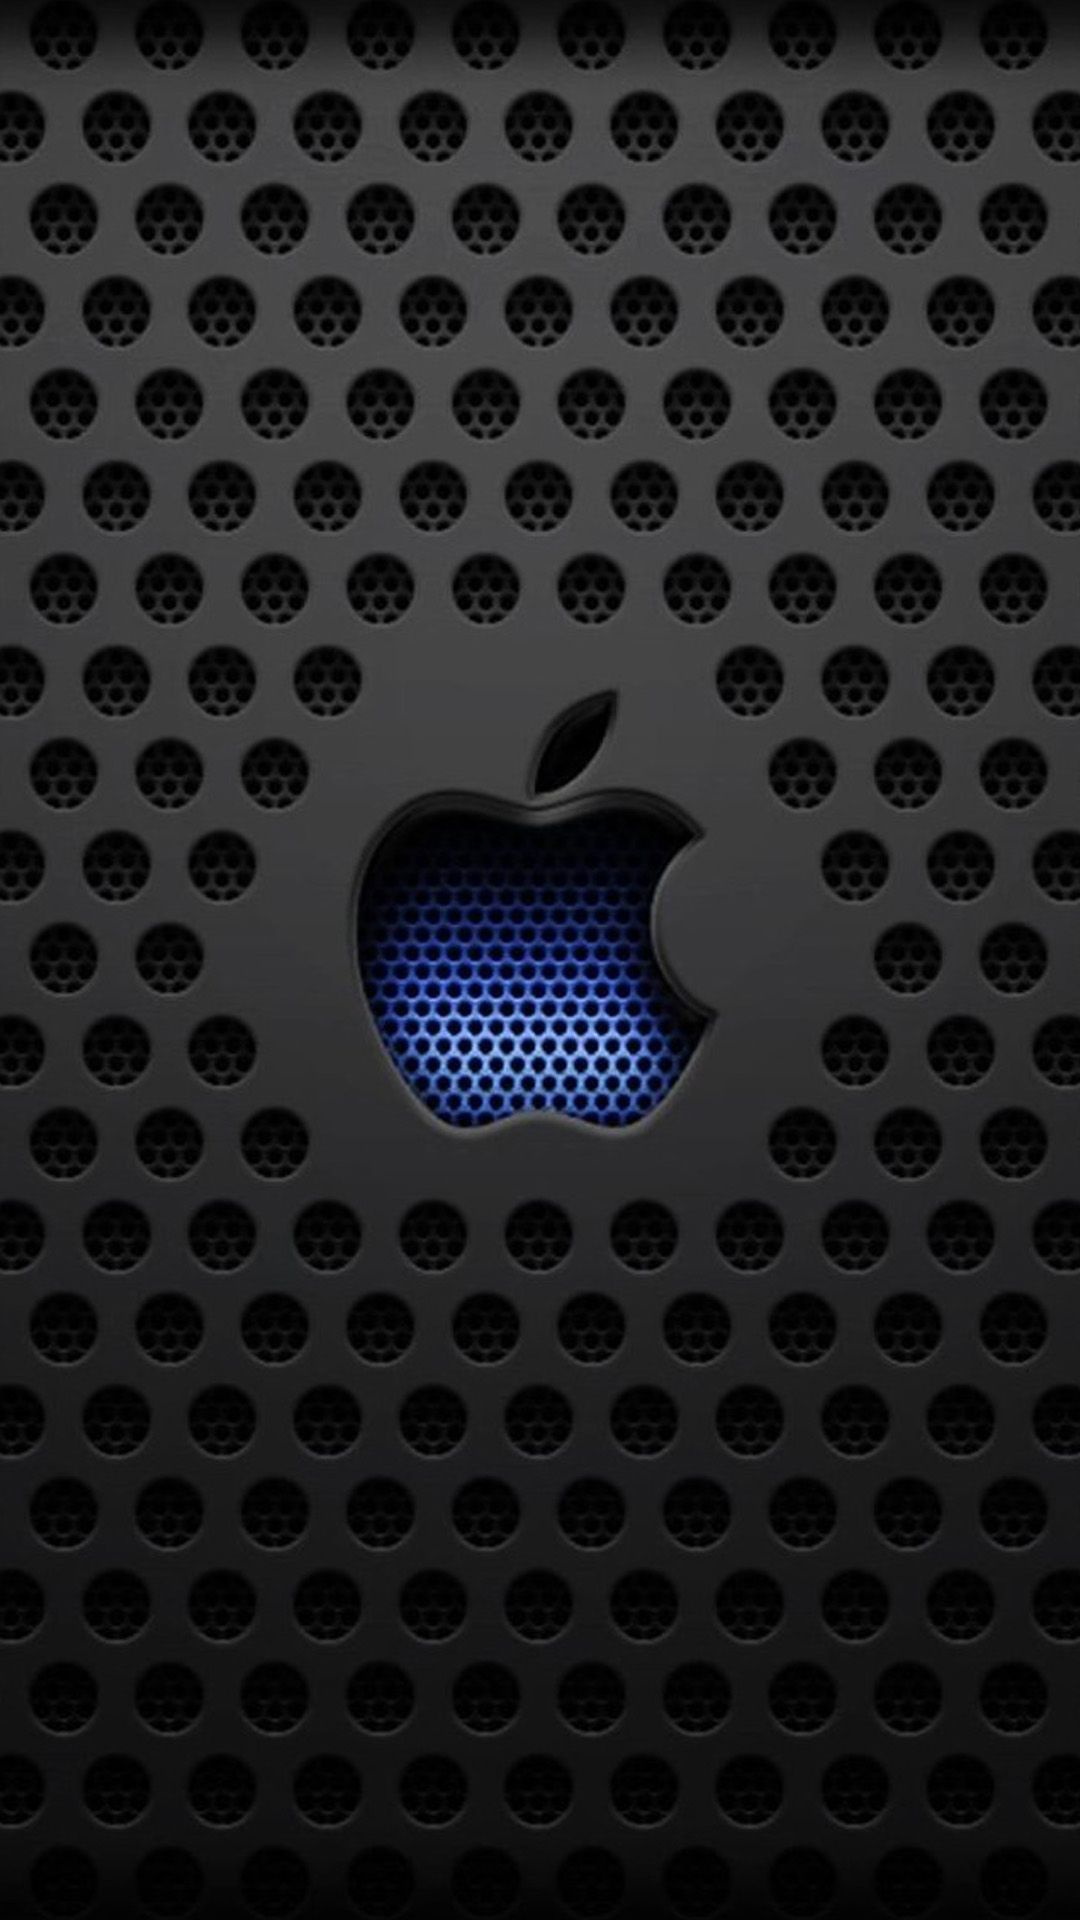 iphone 6 plus wallpaper wallpapers apple logo wallpaper iphone rh pinterest com